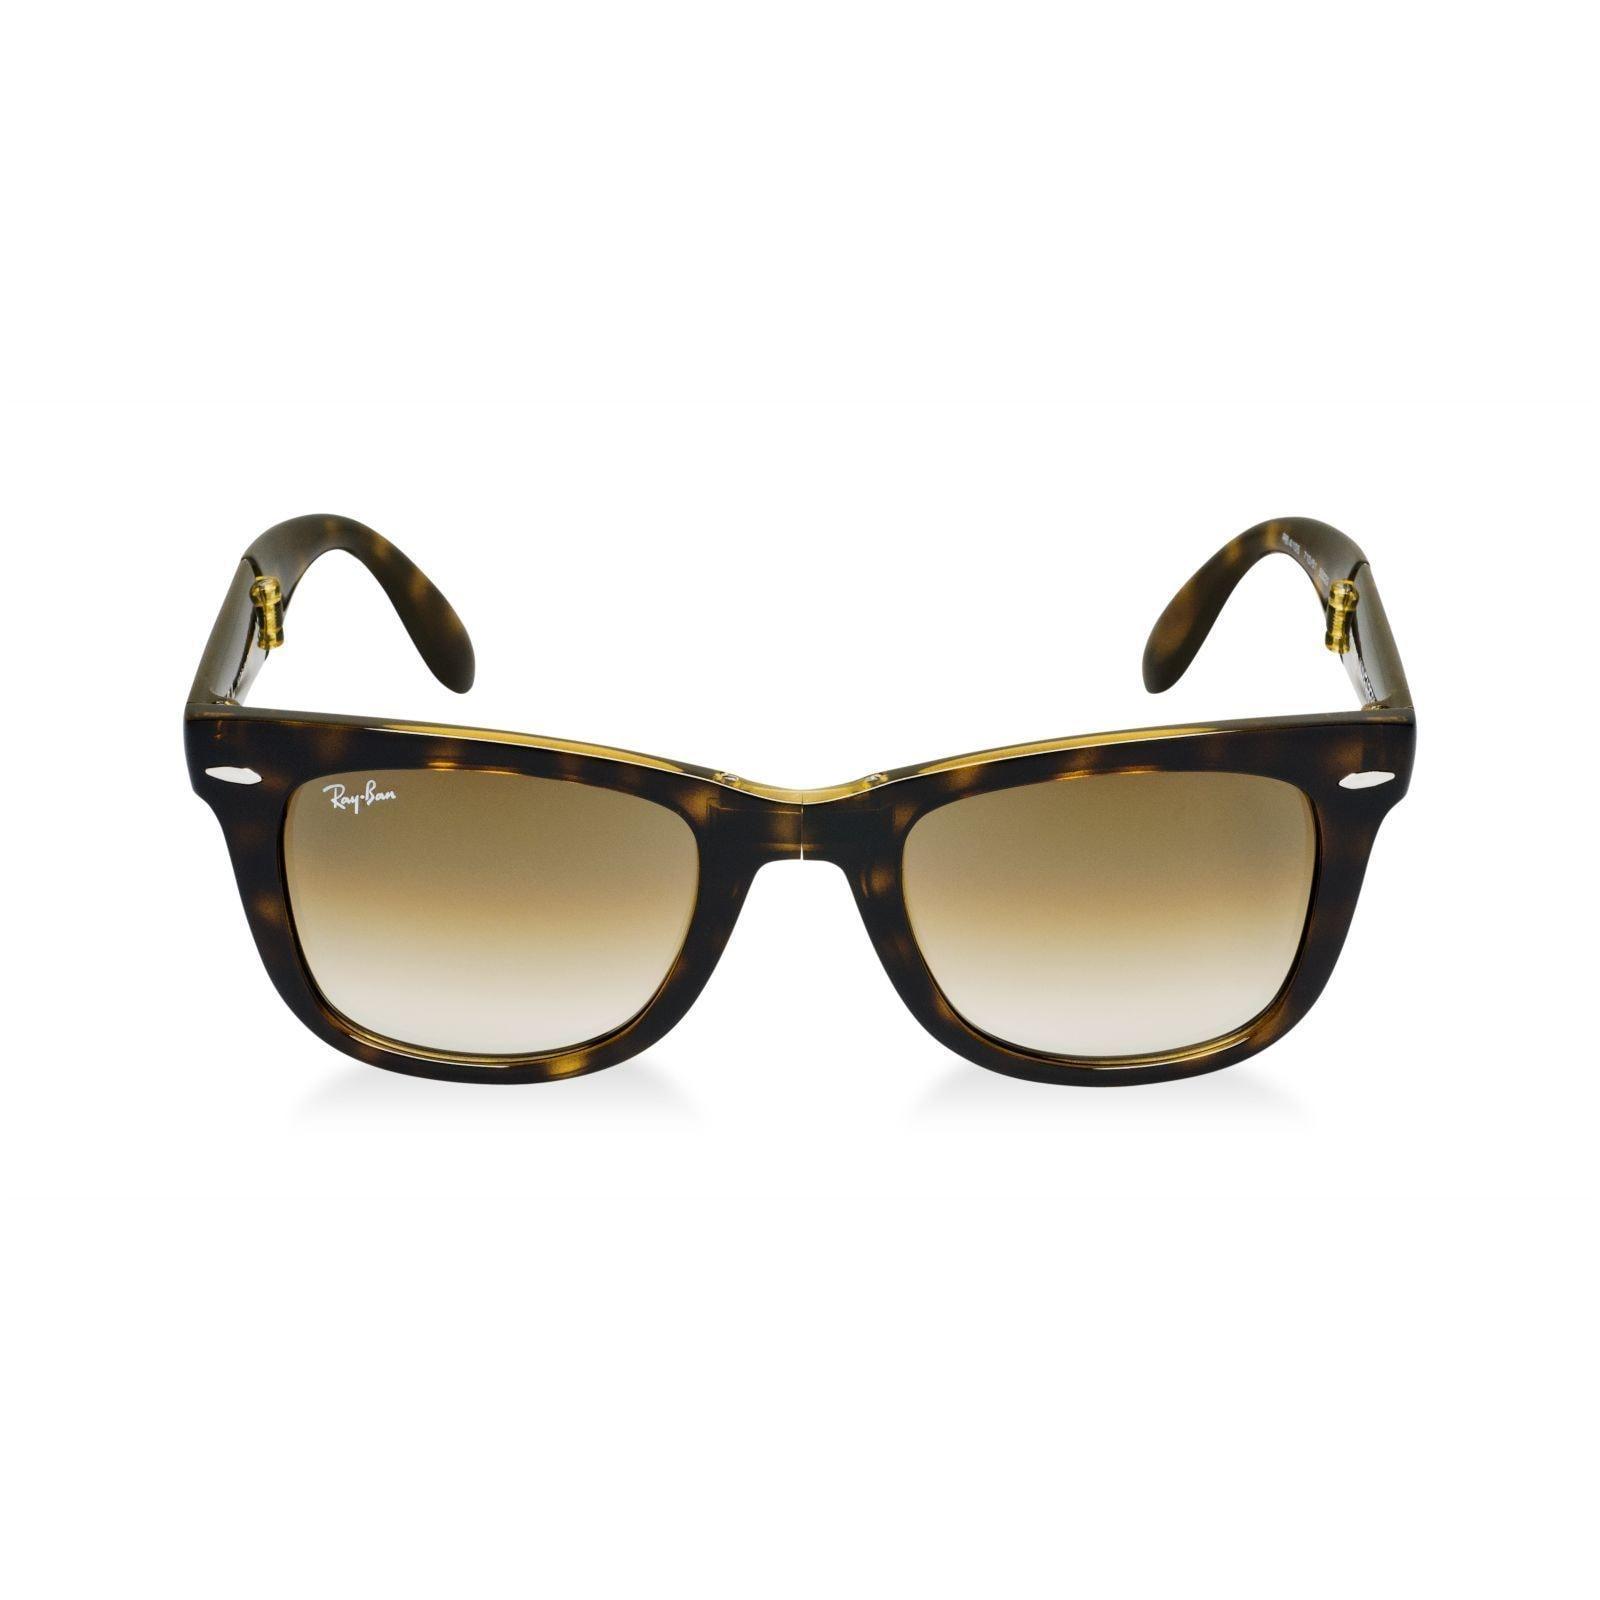 0e06430ed5 Shop Ray-Ban Wayfarer Folding RB4105 710 51 Unisex Tortoise Frame Light Brown  Gradient 54mm Lens Sunglasses - Free Shipping Today - Overstock - 15288001